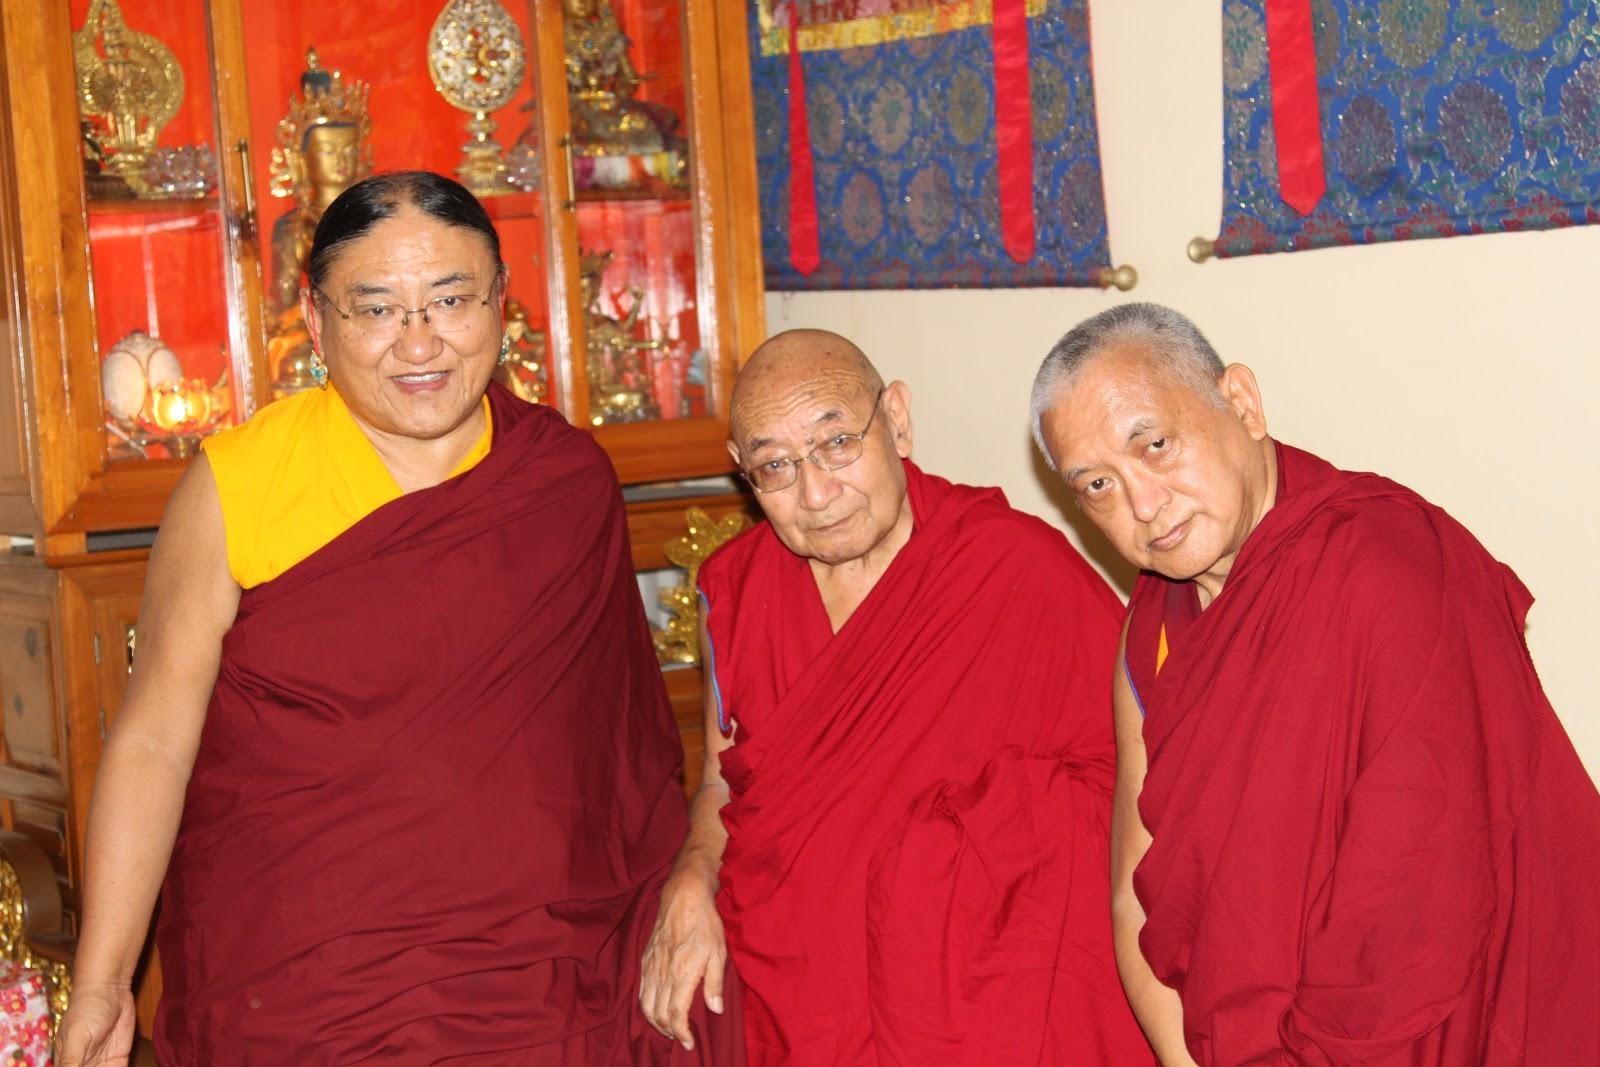 Sponsoring rare oral transmissions from HH Sakya Trizen